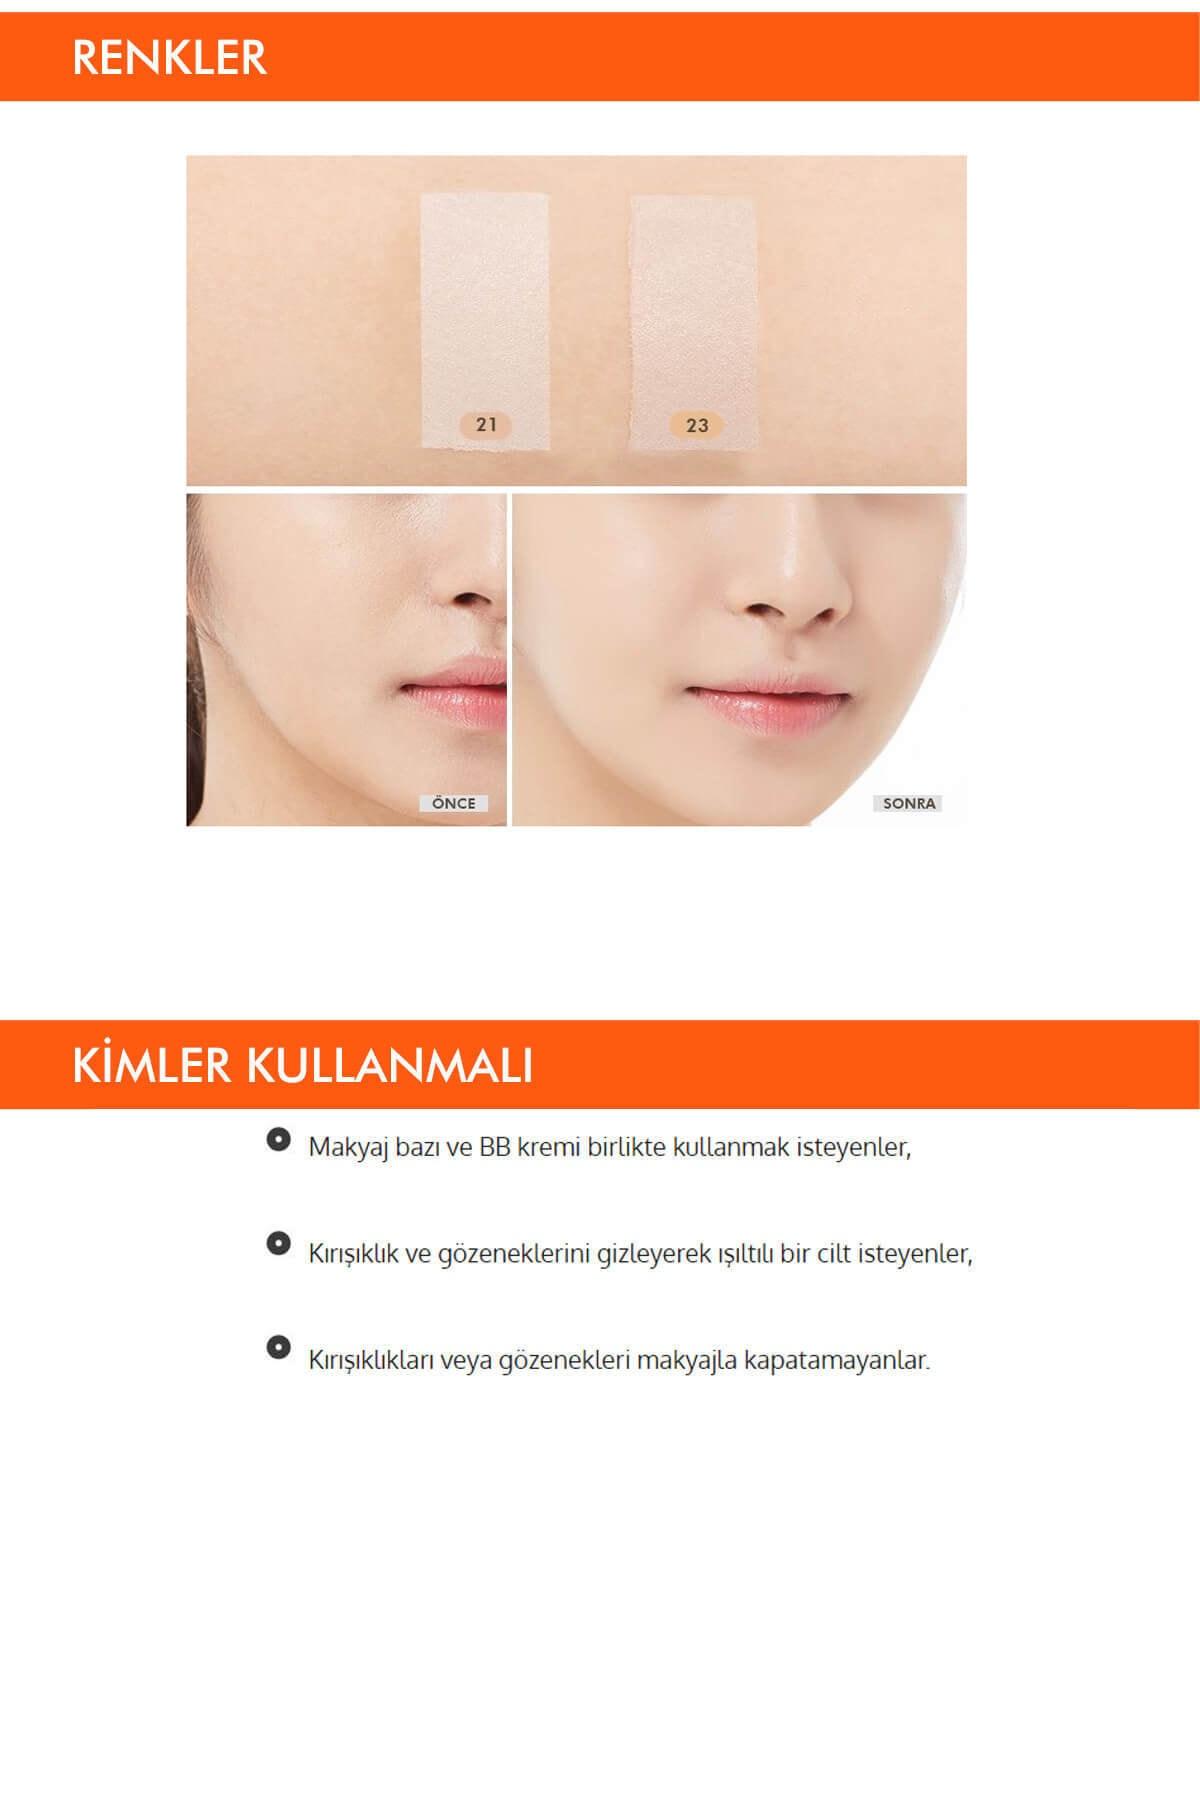 Missha Gözenekleri ve İnce Çizgileri Kapatan BB Krem 44g Signature Wrinkle Fill-up BB Cream SPF37PA++No.23 3